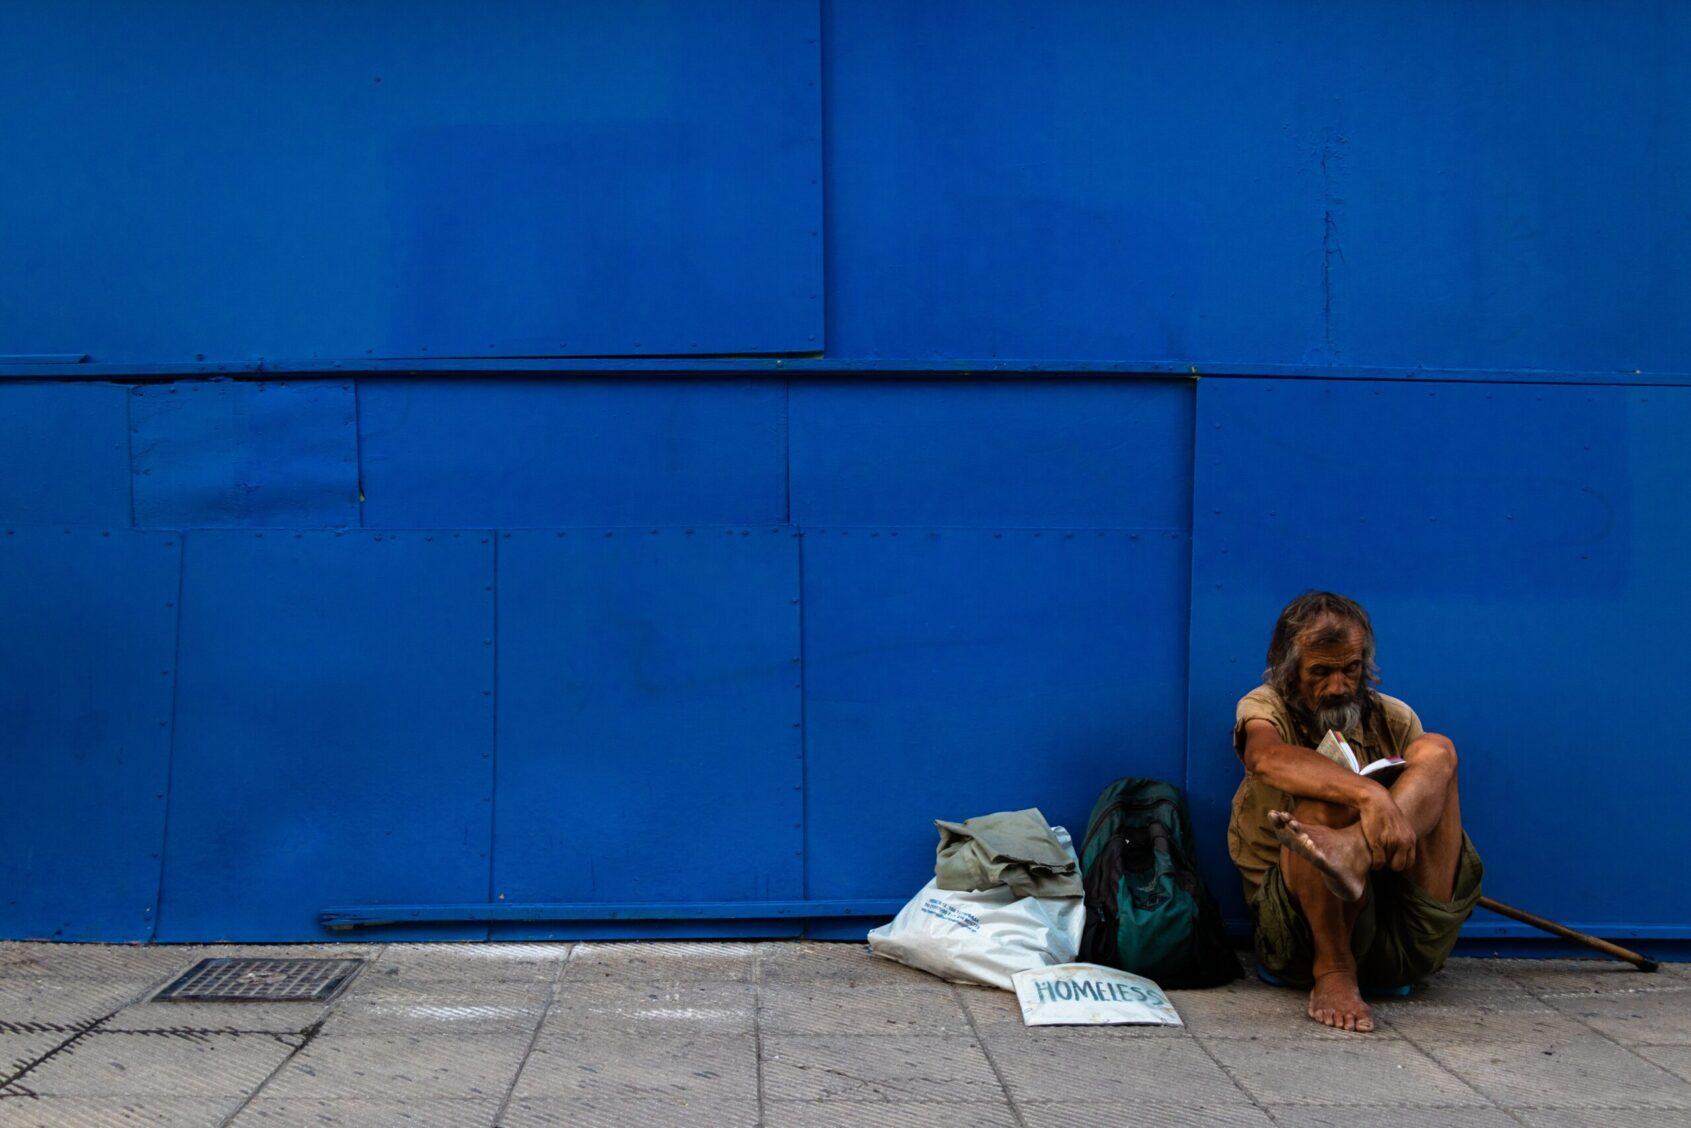 Valentine's Day Story, Homeless